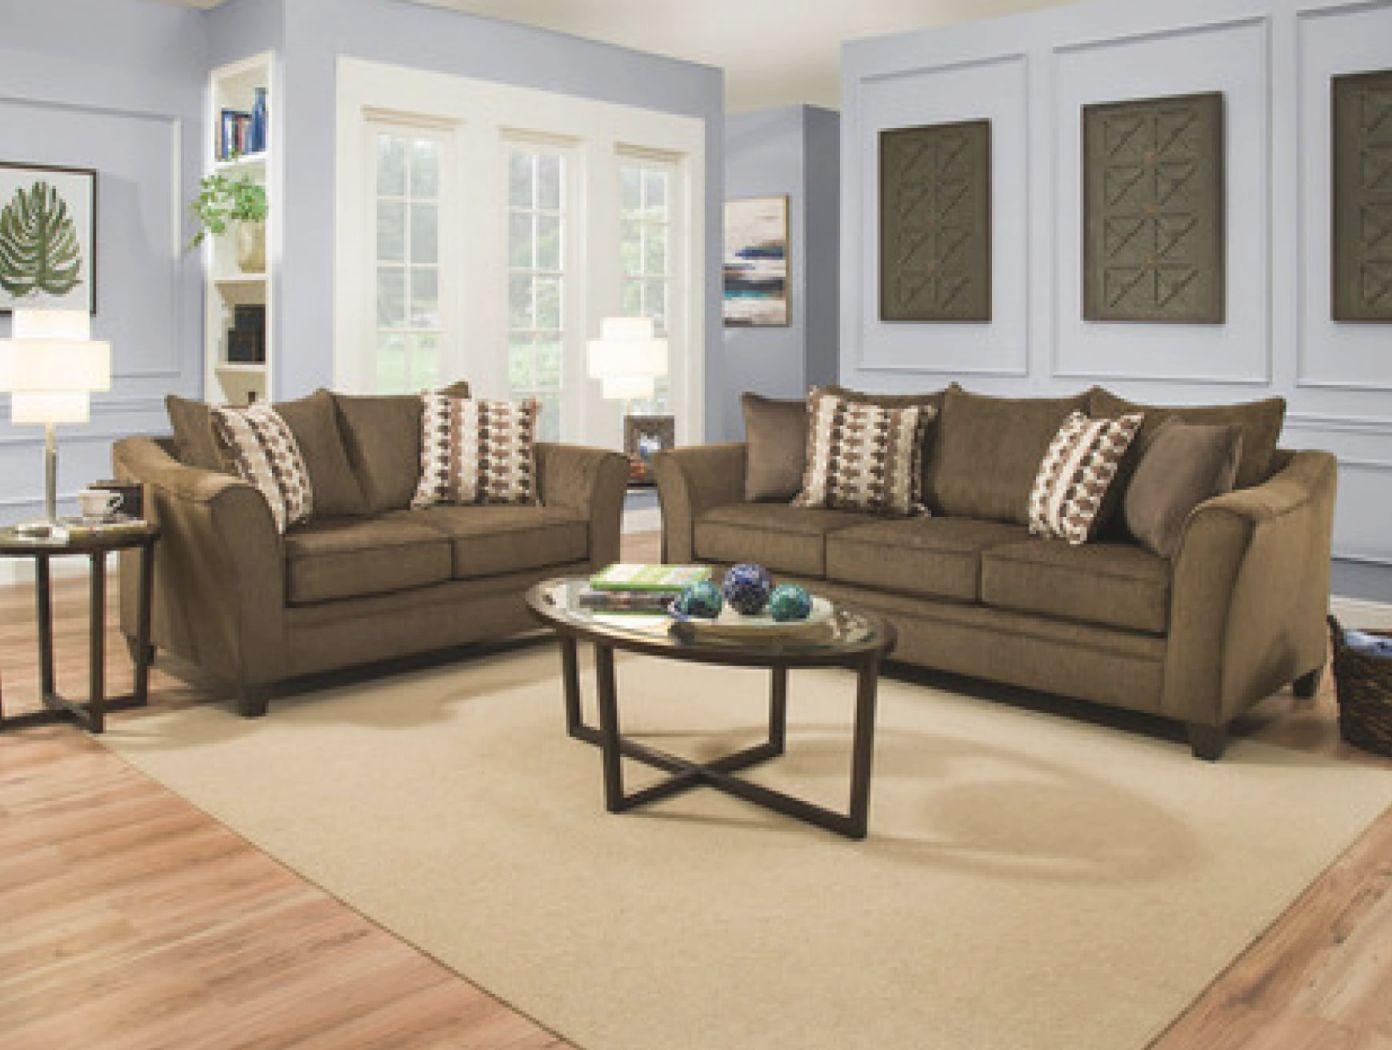 Simmons | Davis Home Furniture - Asheville, Canton inside Simmons Living Room Furniture